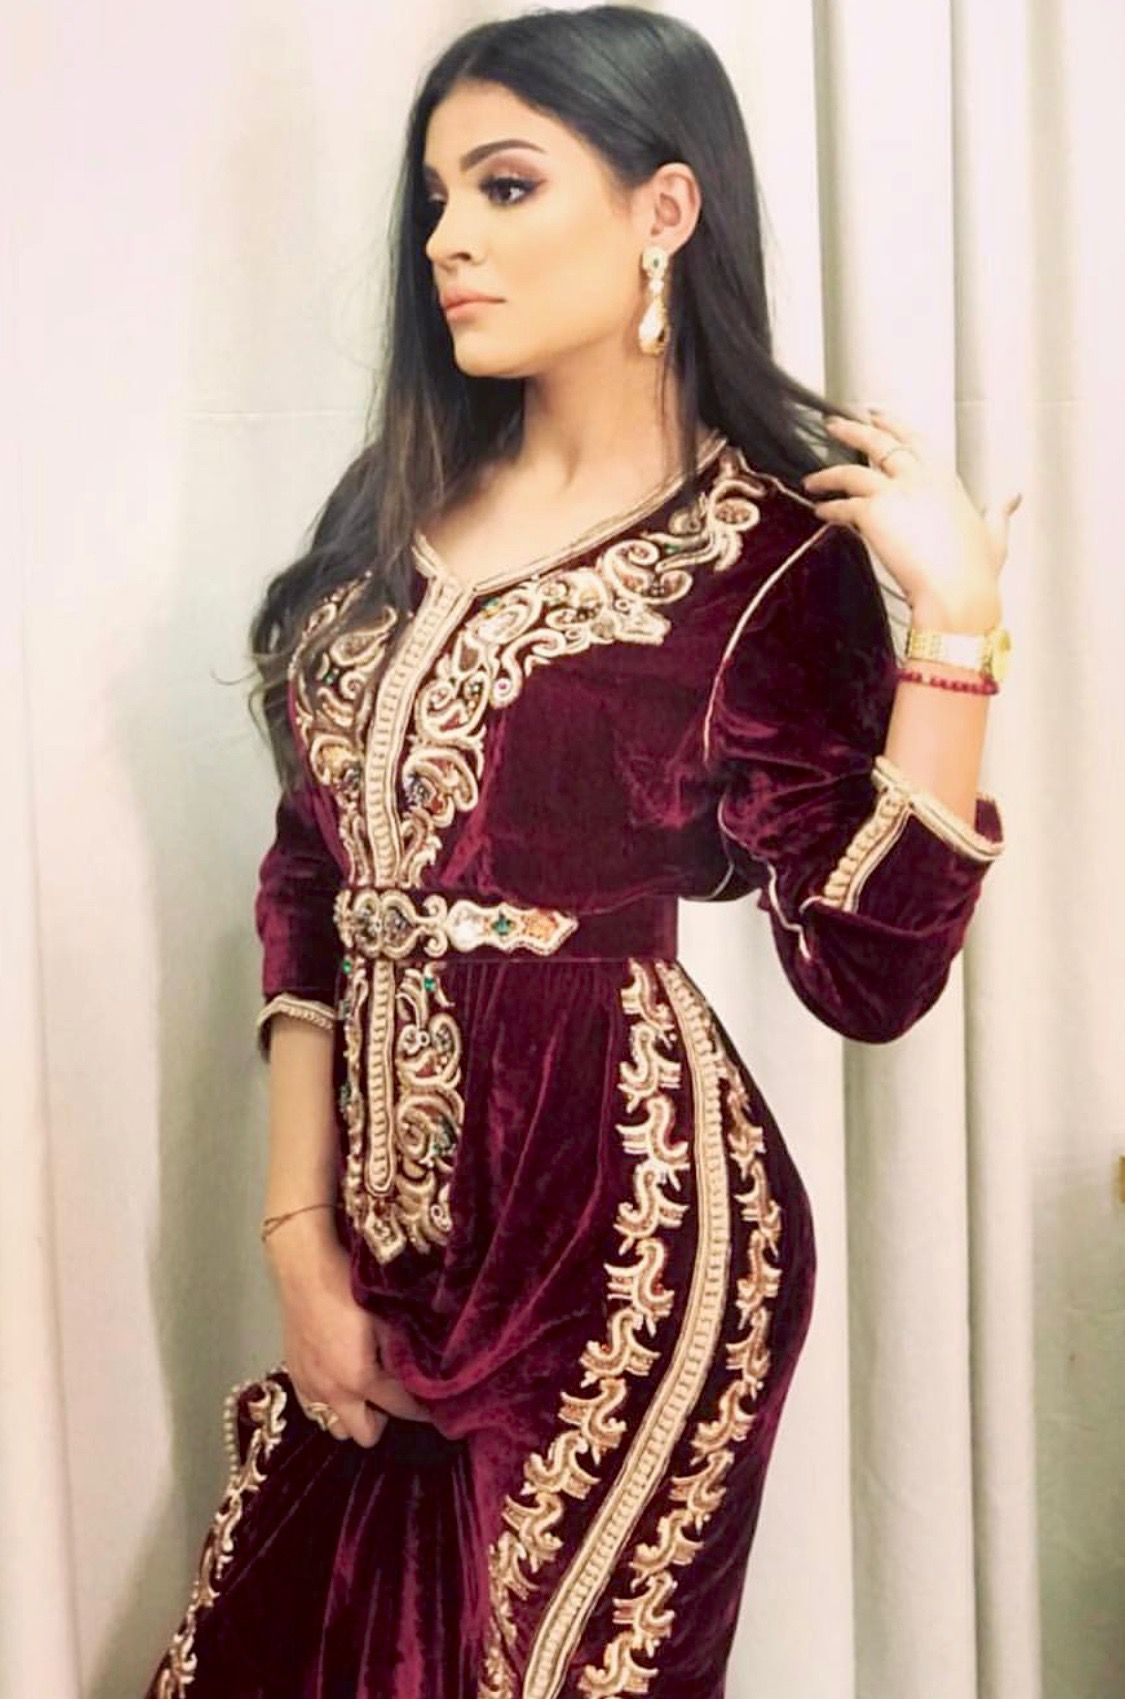 abe48d01cf11c Caftan du Maroc Afghan Dresses